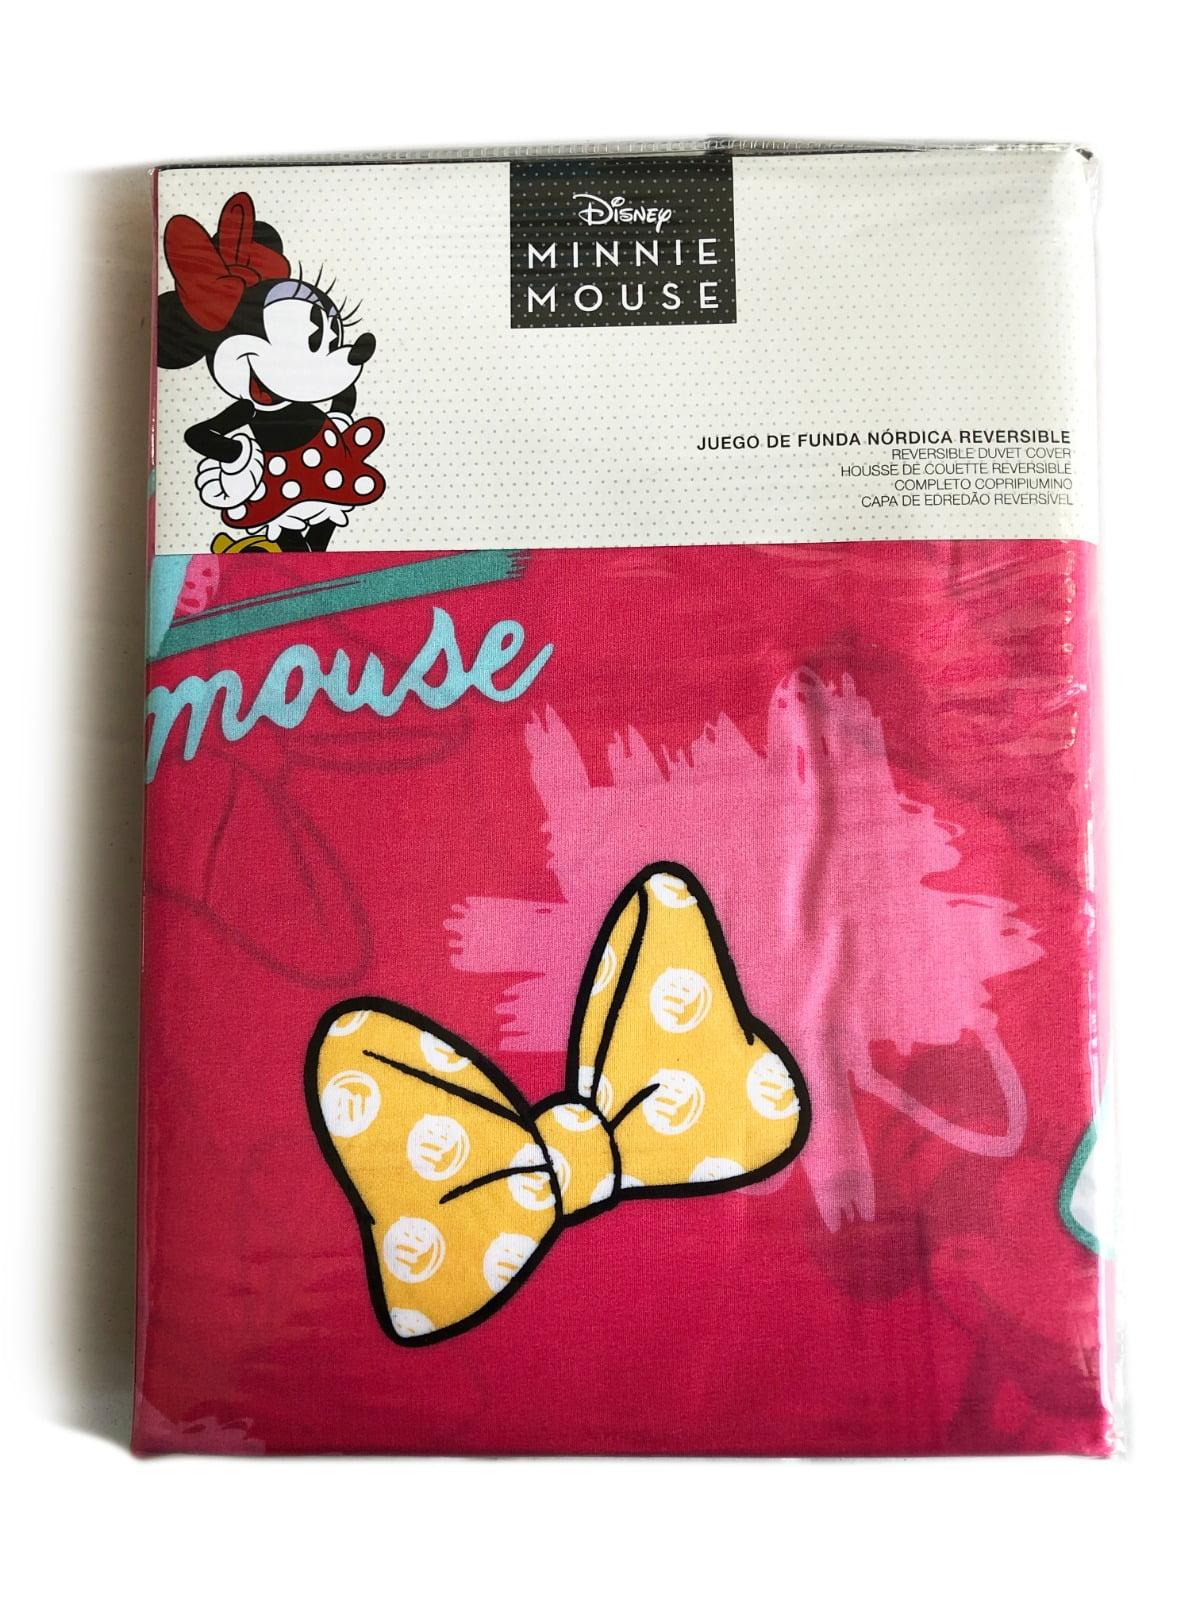 Funda Nórdica Reversible 2pz. Minnie